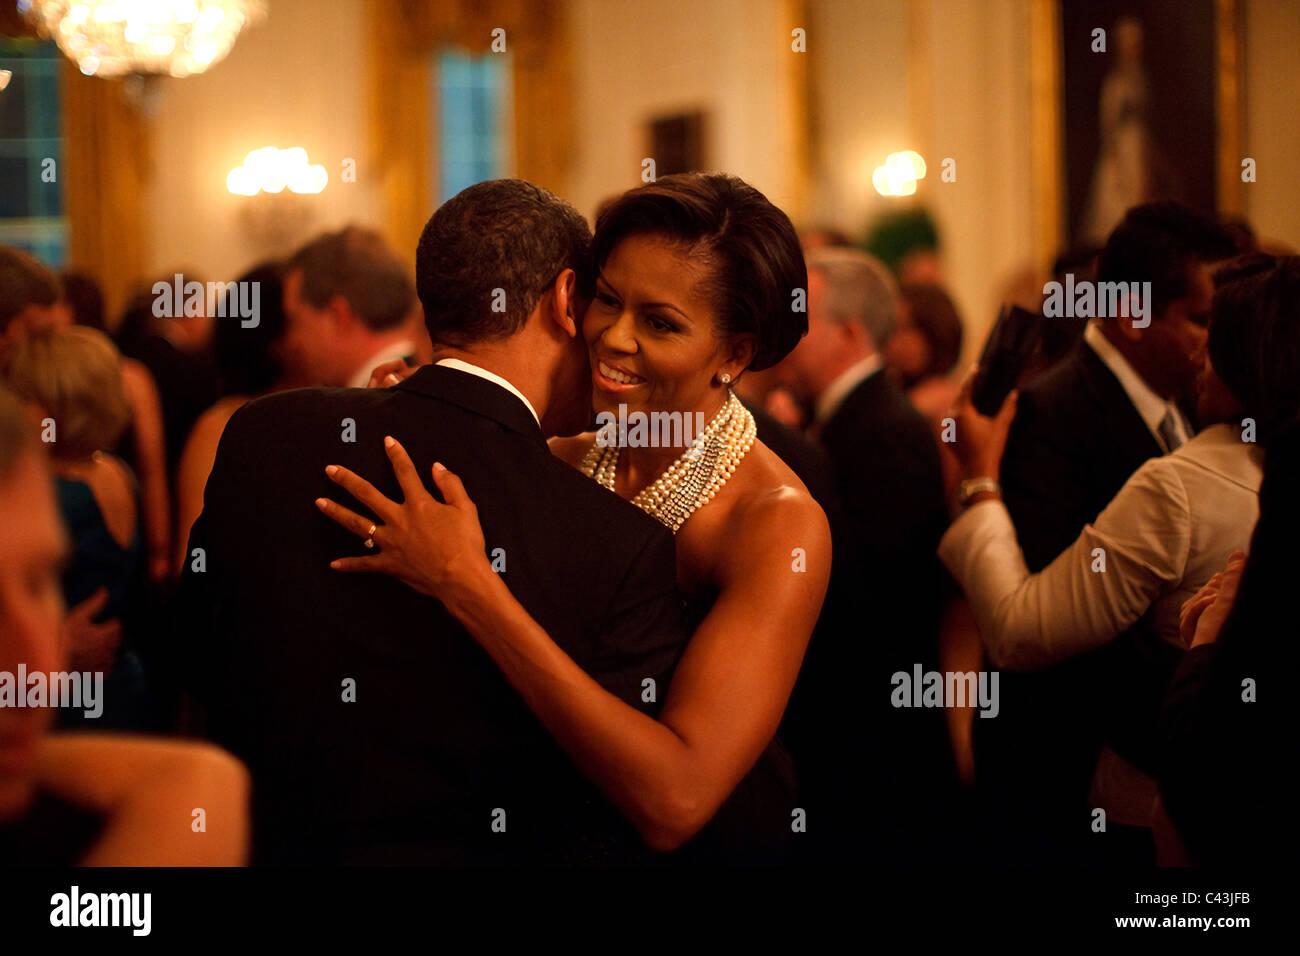 barack obamaís views essay Social media alternative views of the  this essay is based on semistructured  barack obamaís improbable electoral victory in november 2008.